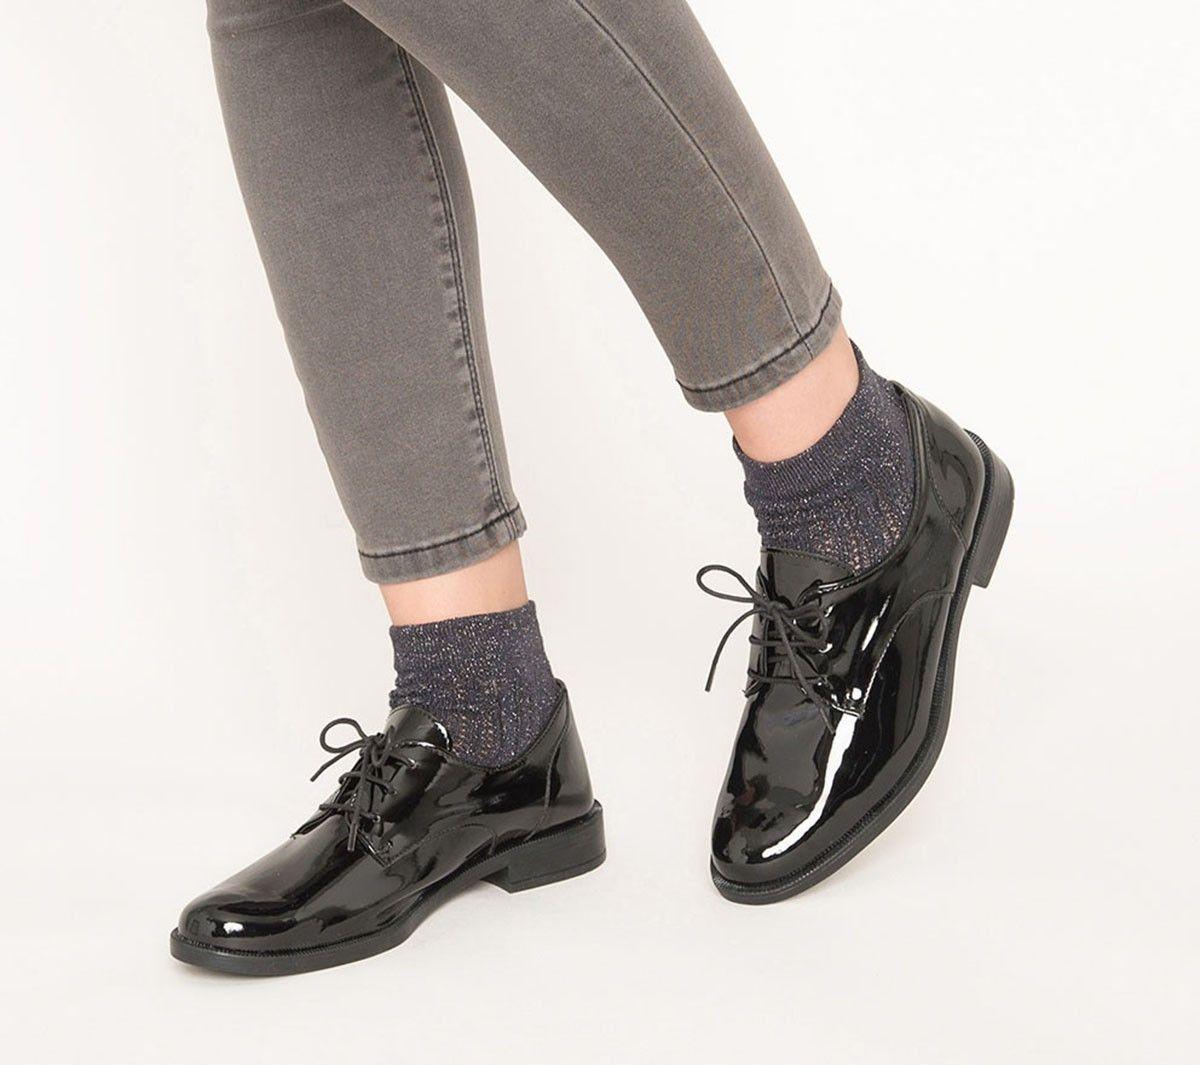 00a5a7603be195 Derby verni noir | Chaussures | Derby vernis, Derby noir et Derby